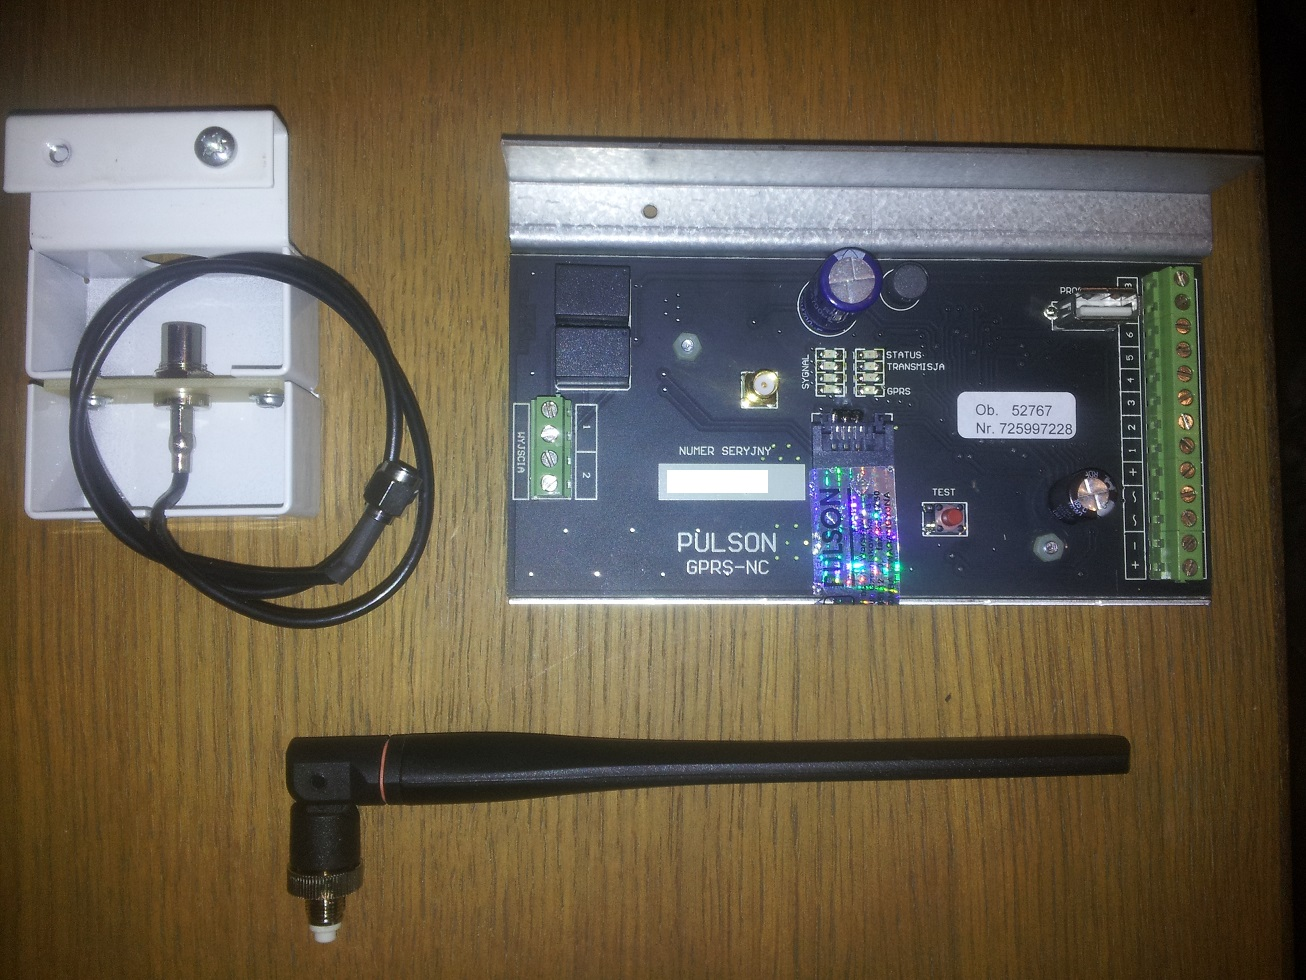 [Sprzedam] Pulson GPRS-NS Nadajnik USB/SIM